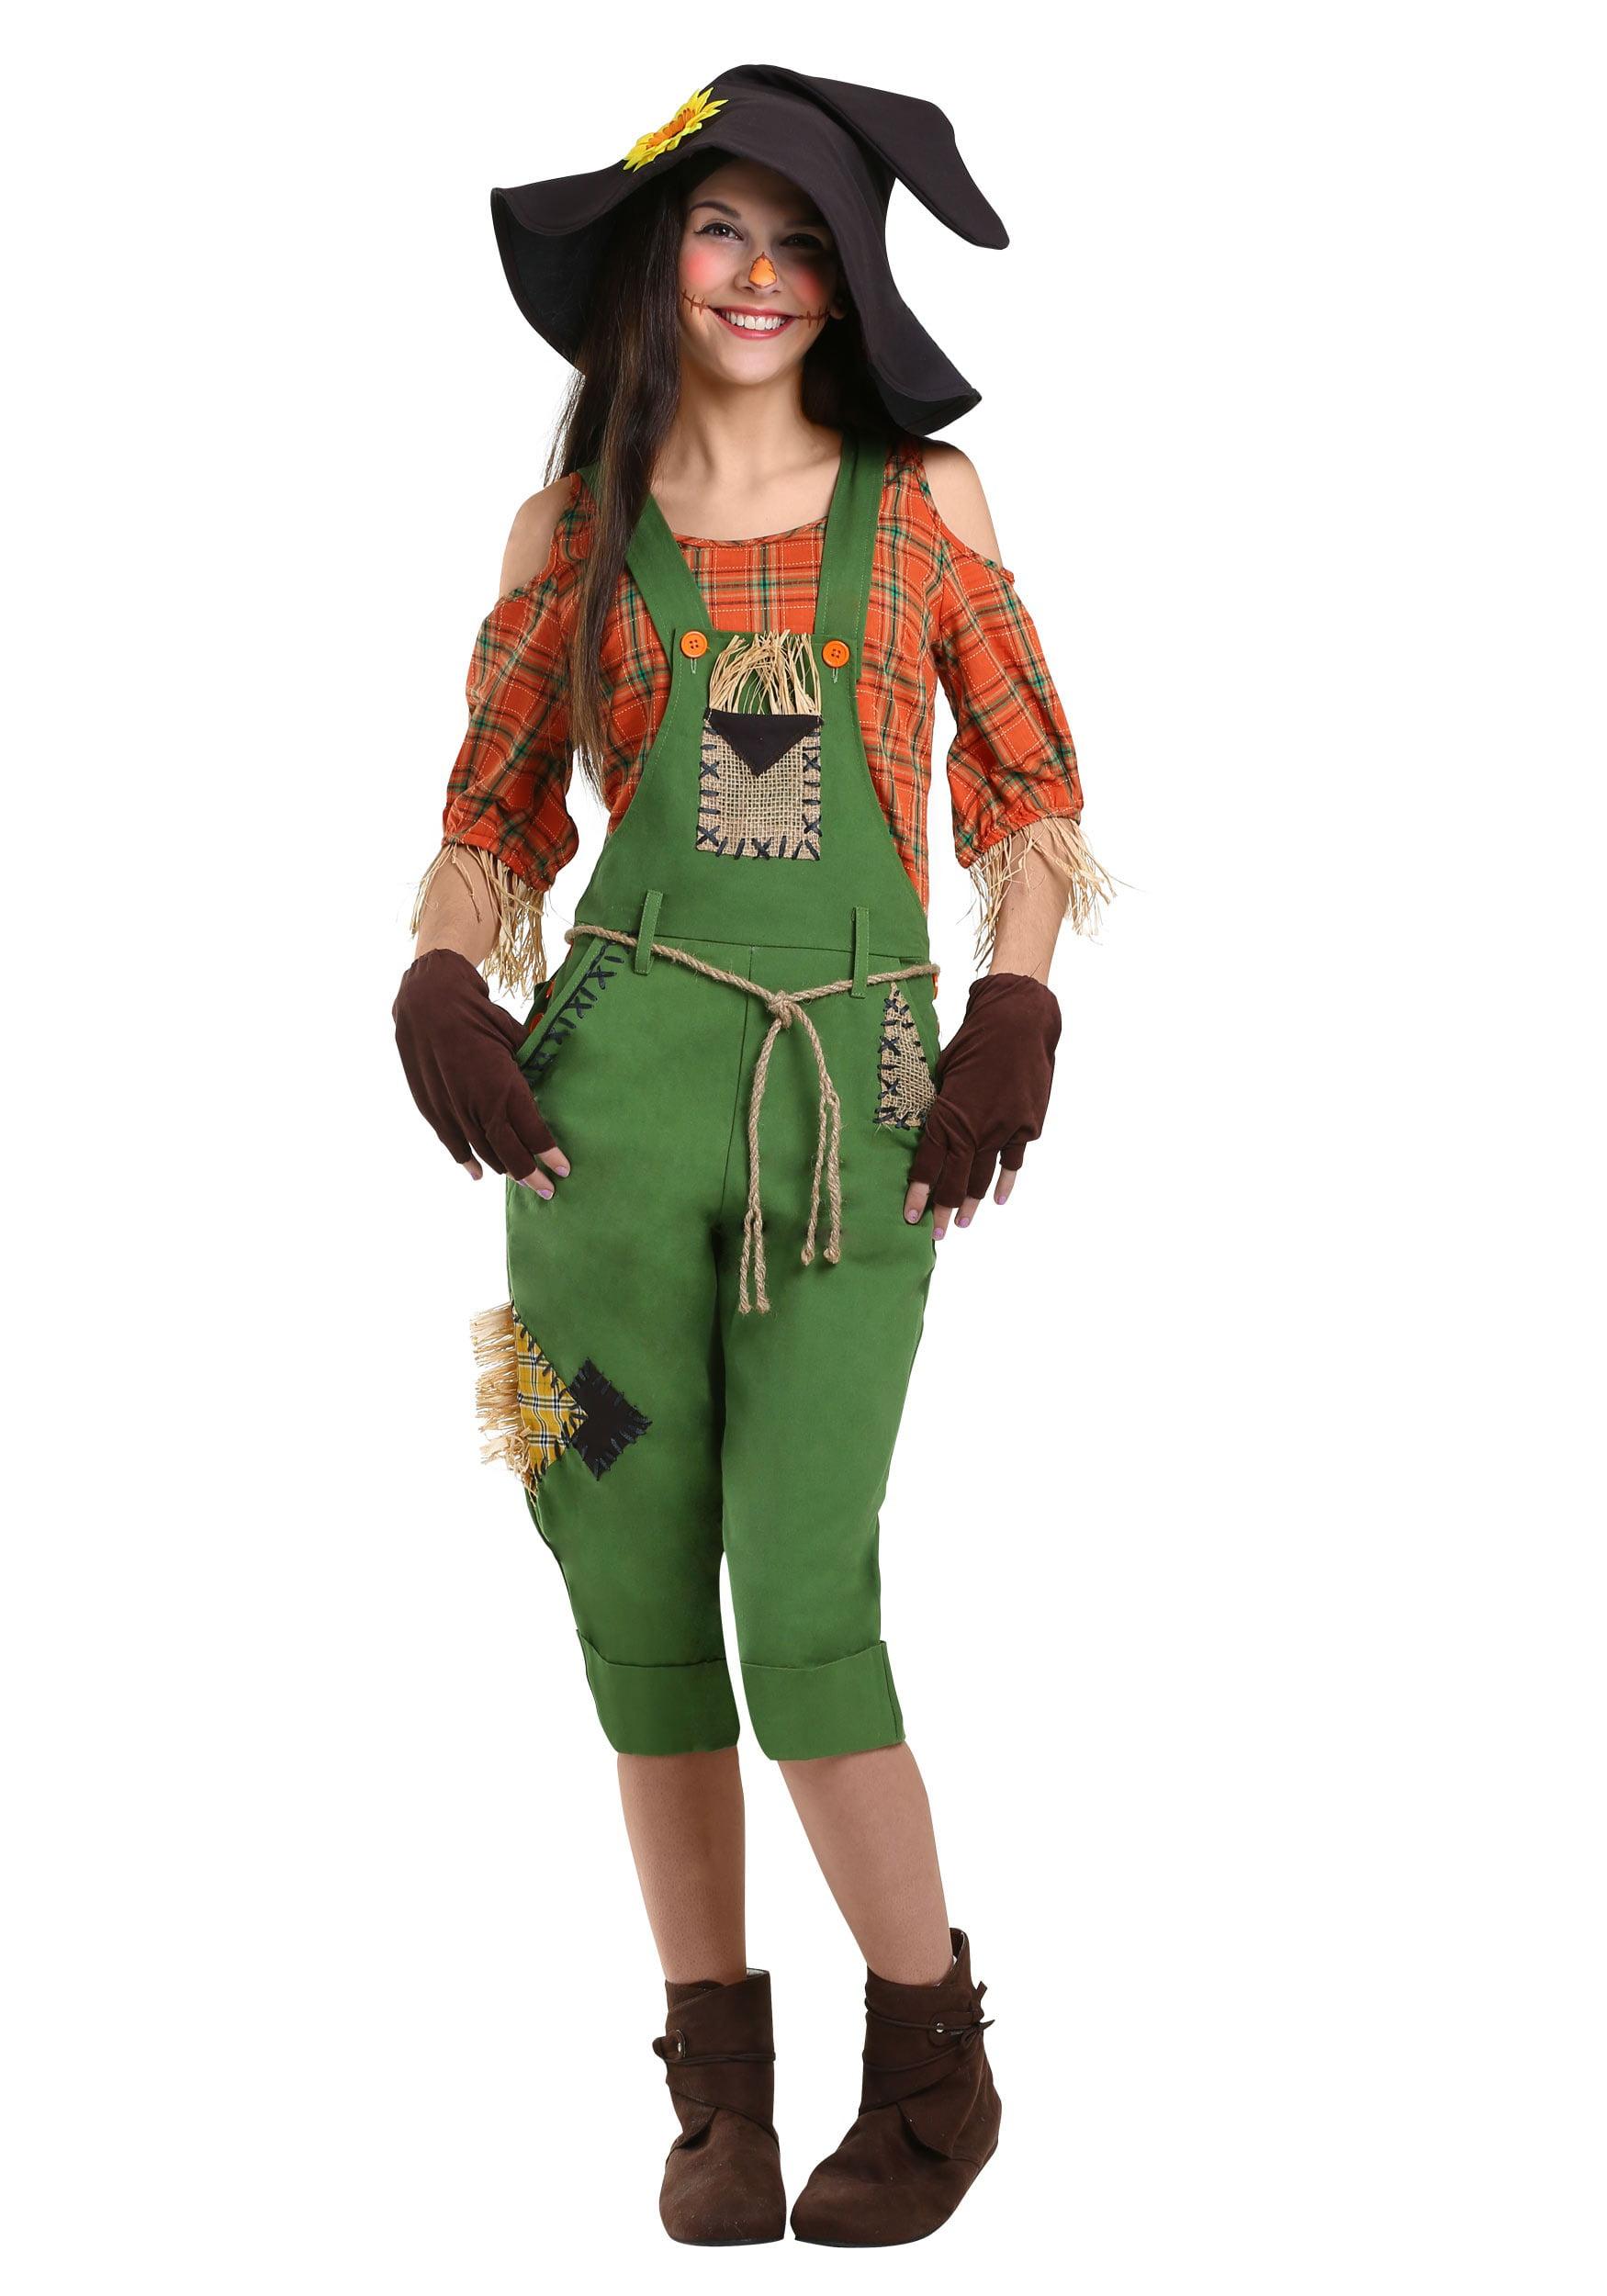 e5ae7f8b70819 Adult Halloween Costumes - Funny & Easy | Walmart Canada